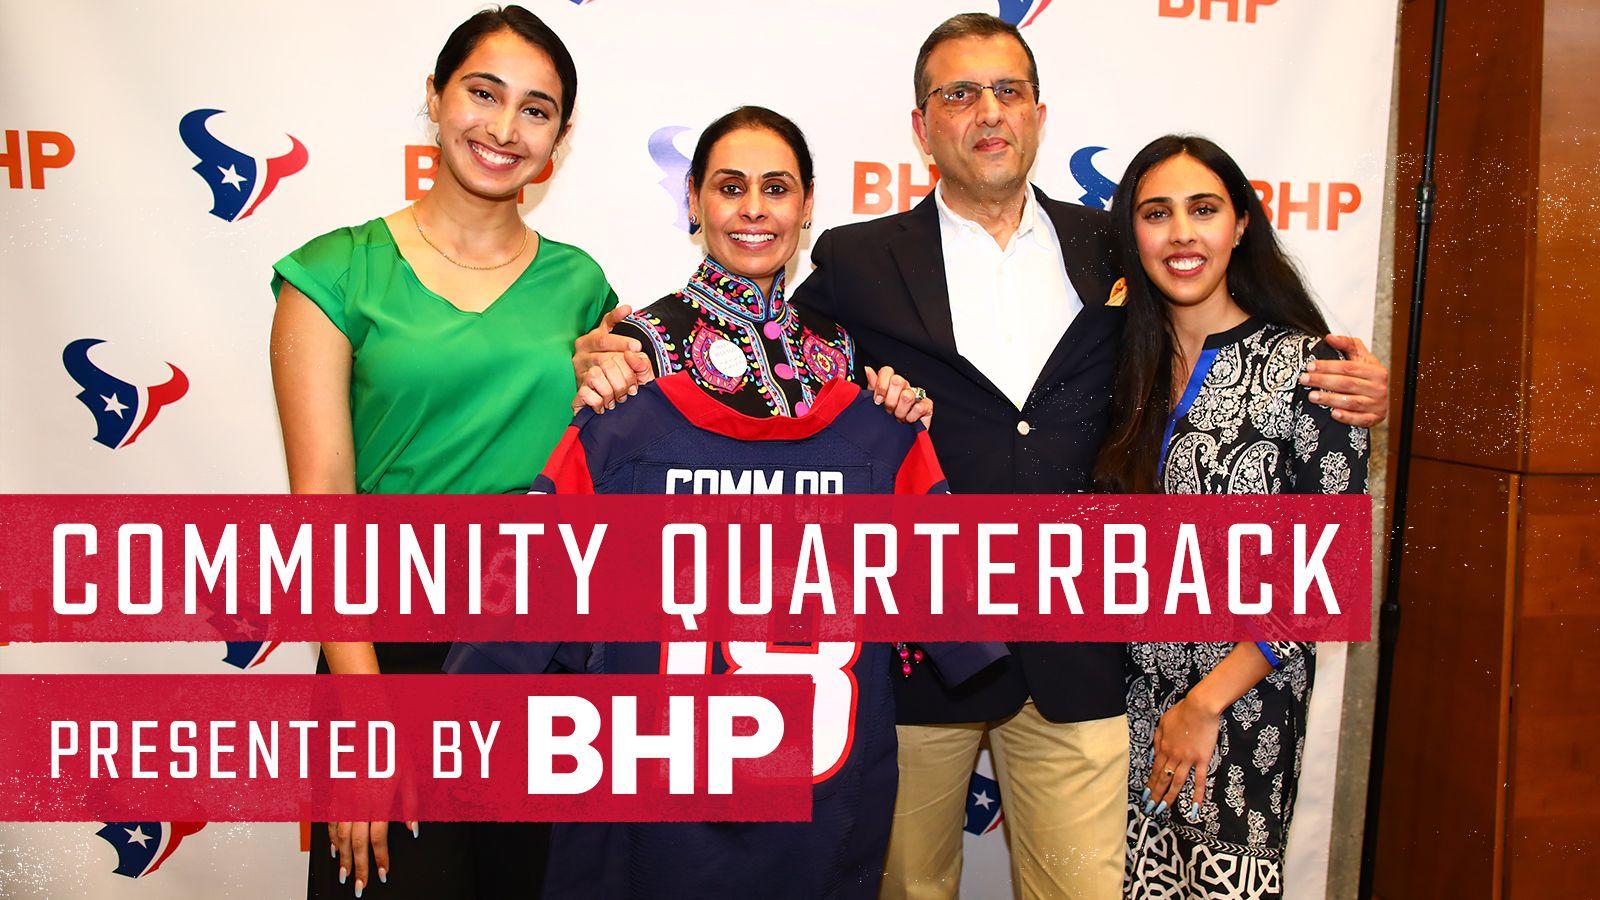 Community Quarterback presented by BHP